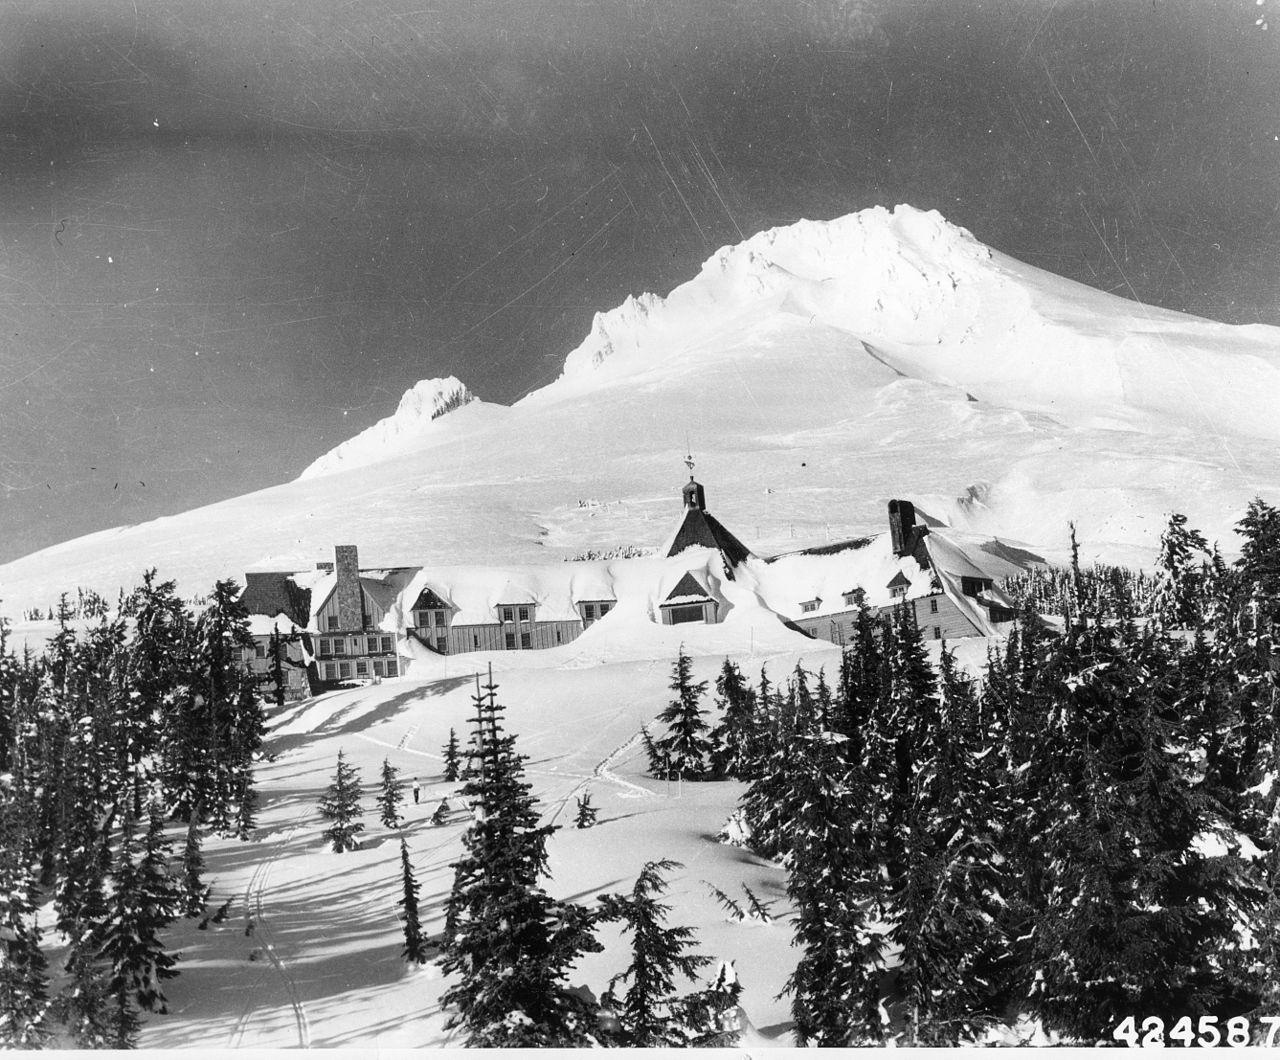 Mt Hood and Timberline Lodge, circa 1943.